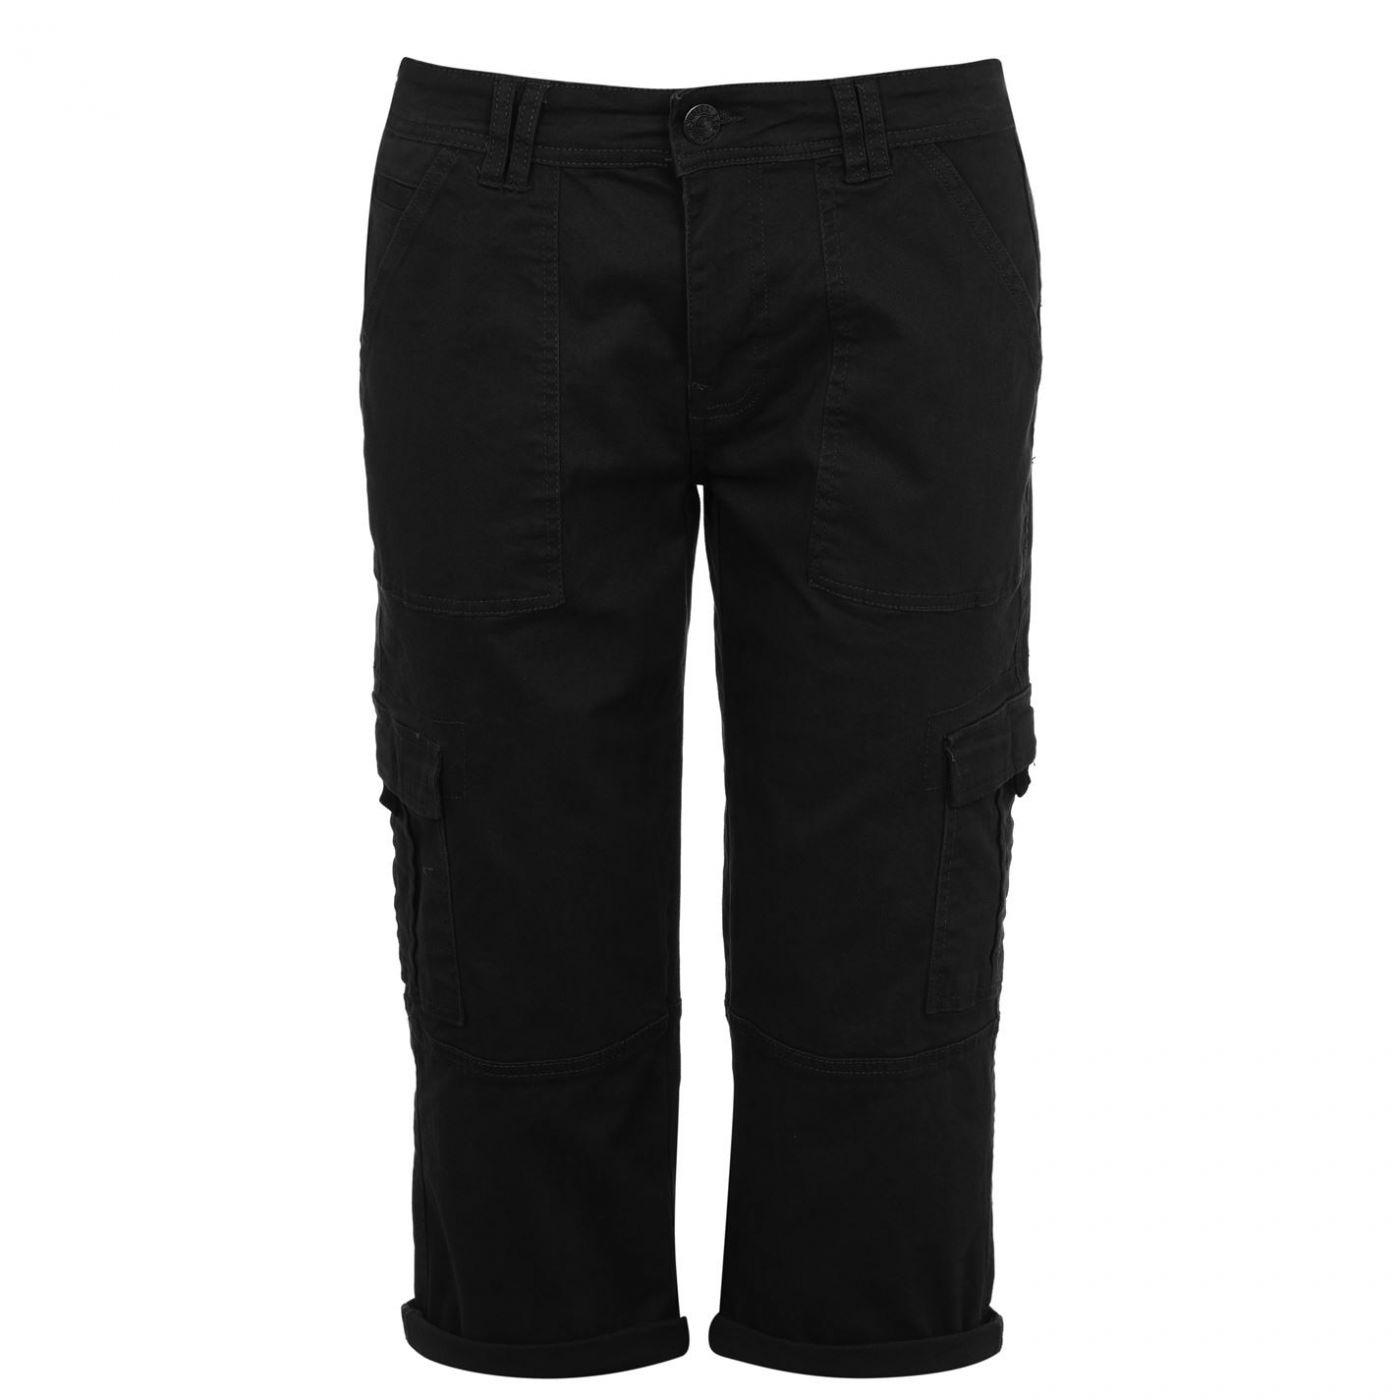 SoulCal Utility Shorts Ladies